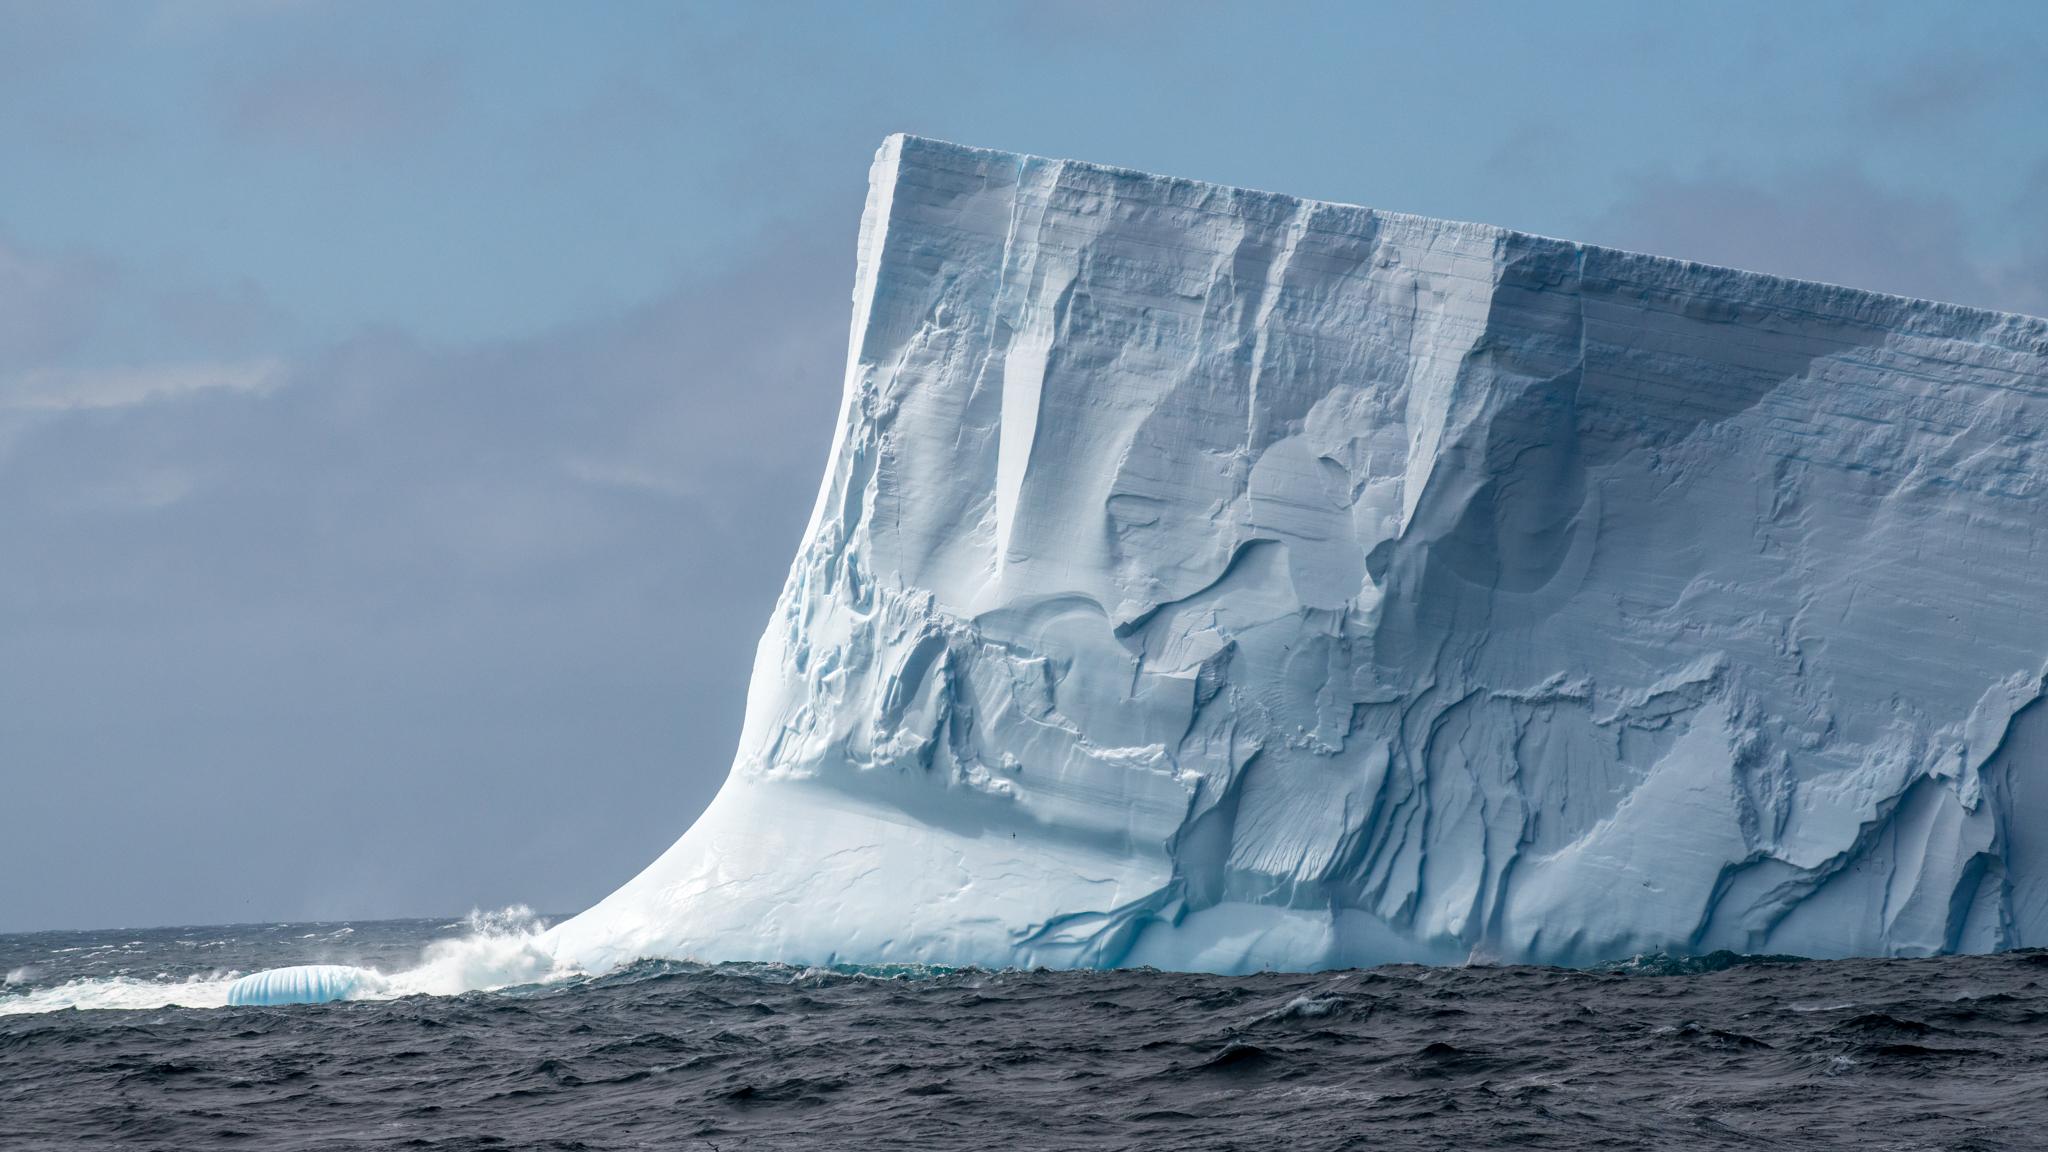 Gerlache Strait, Antarctic Peninsula